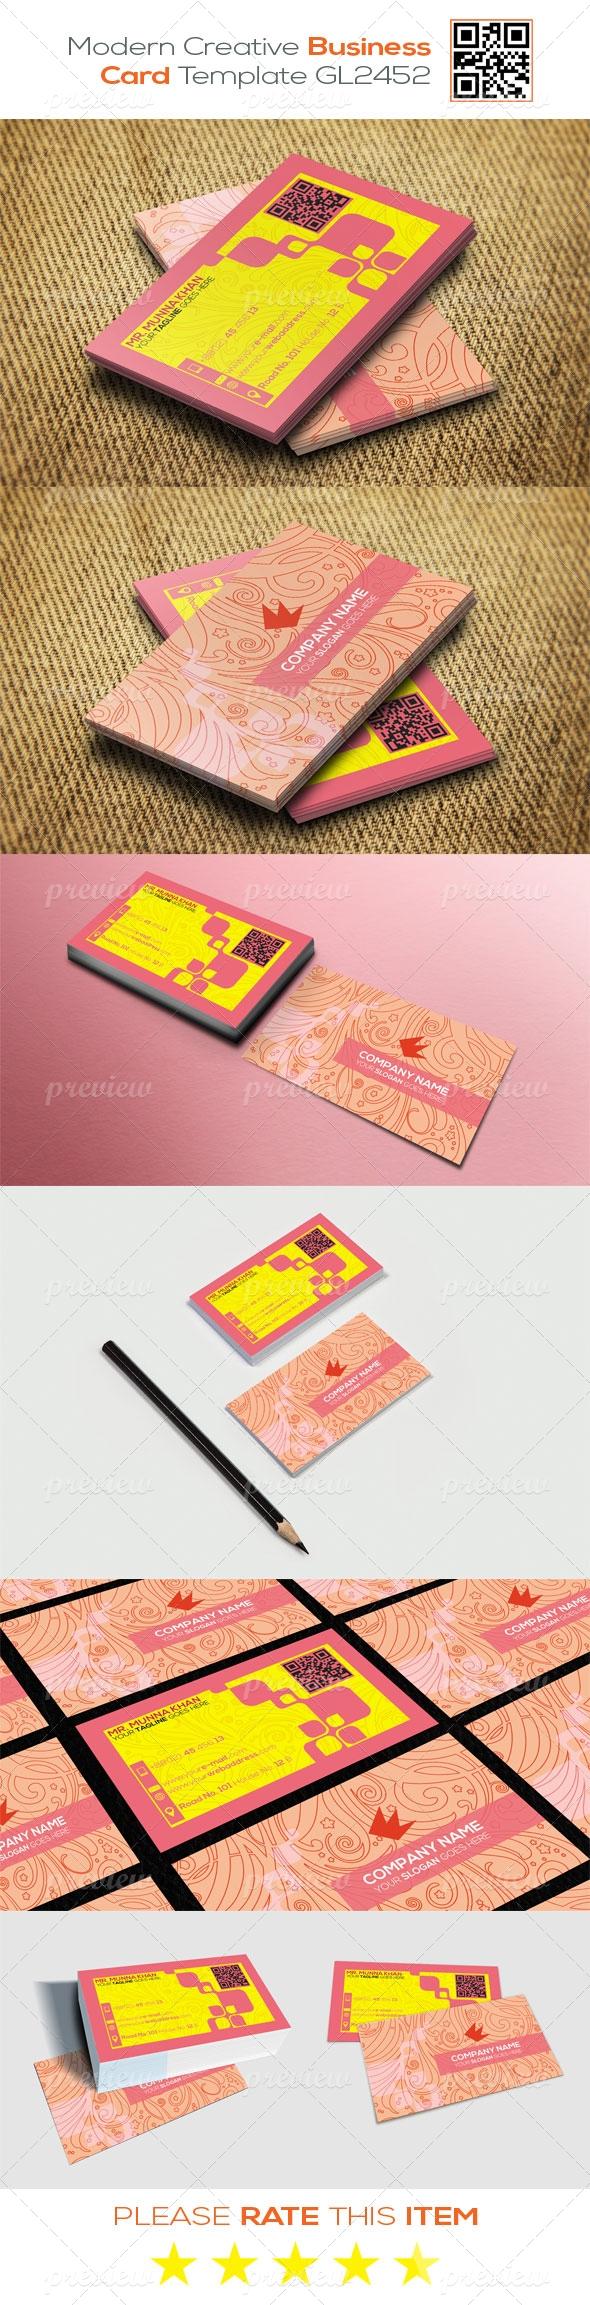 Modern Creative Business Card Template GL2452